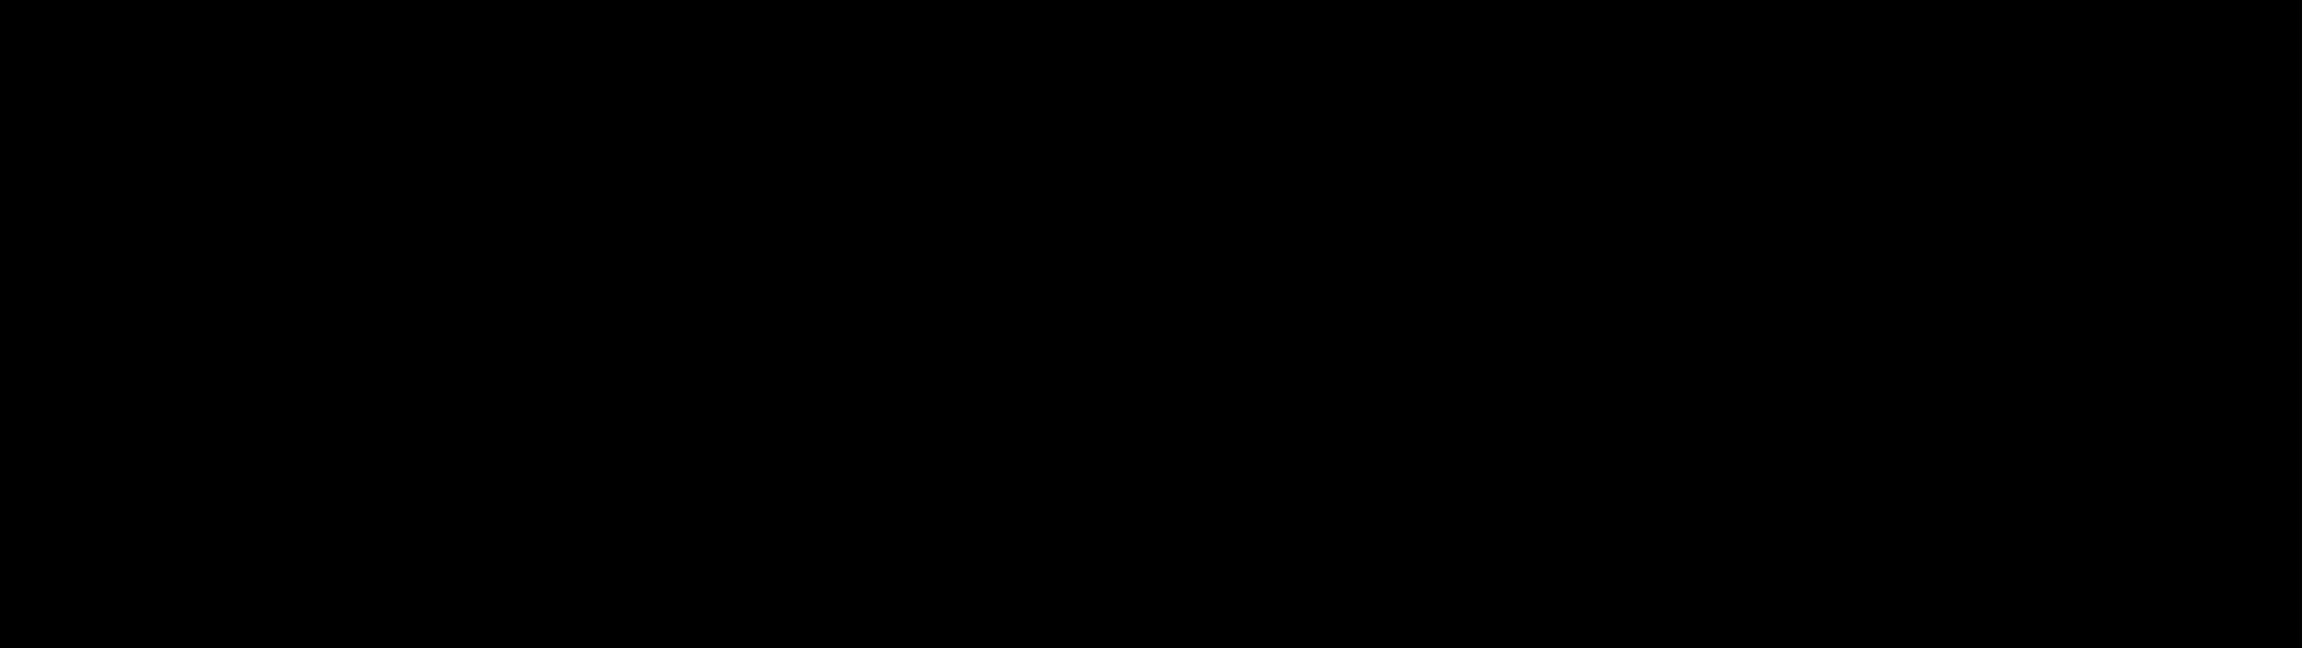 Aripiprazole EP impurity D